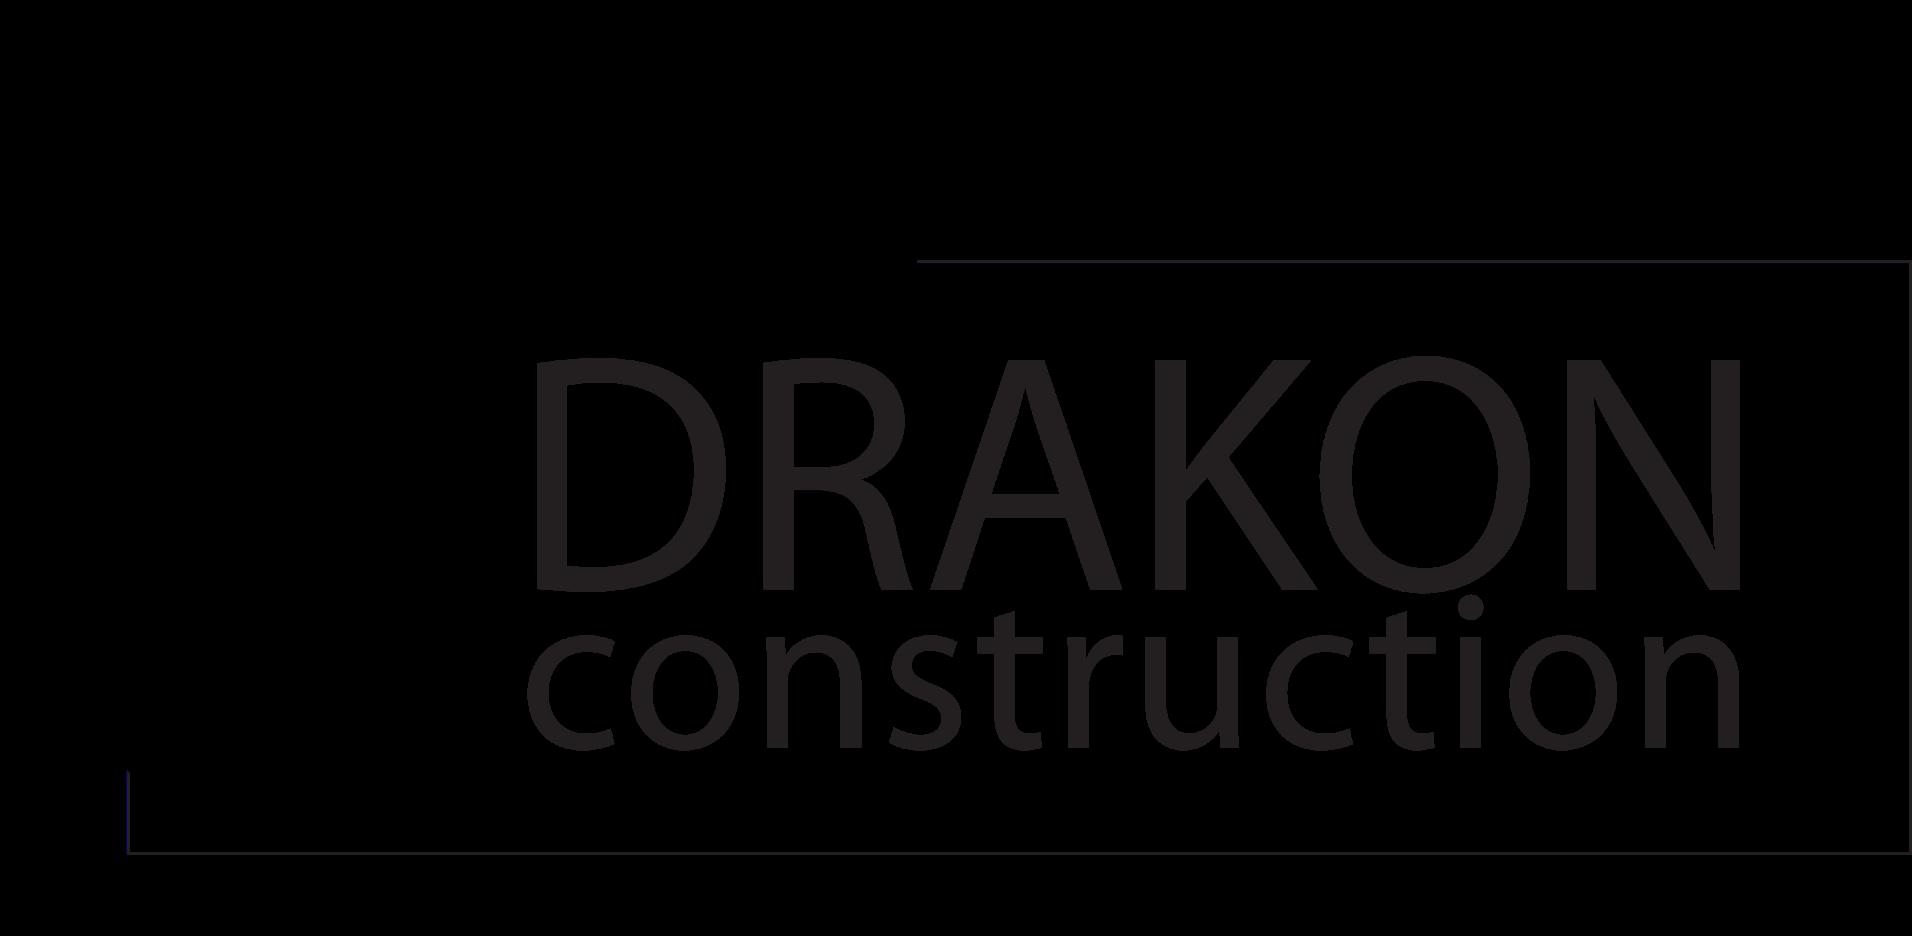 Drakon Construction